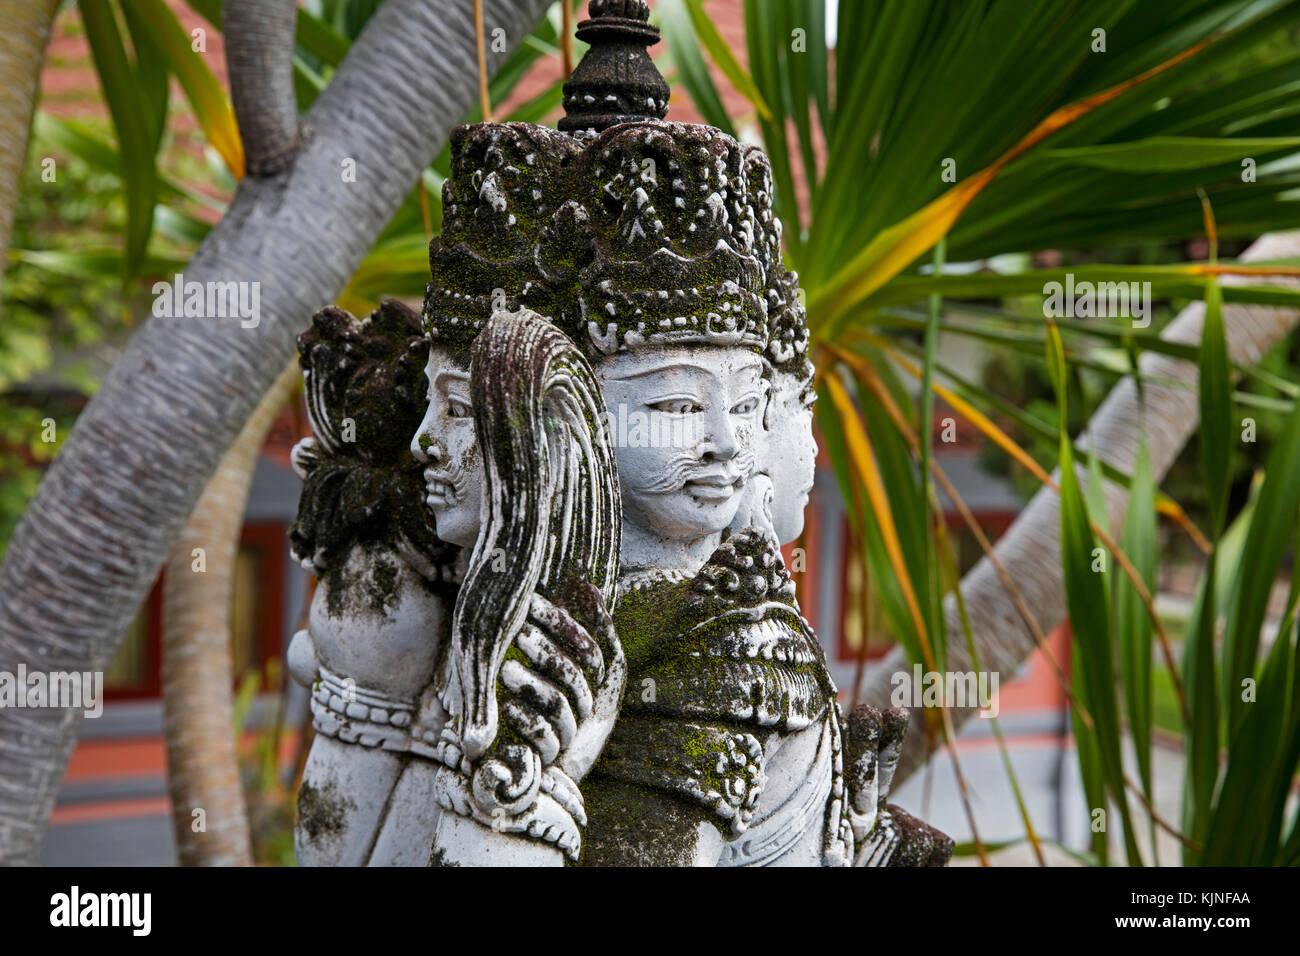 - Brahmavihara Arama/vihara Buddha Banjar/Brahmavihara-Arama, buddhistische Tempel, Kloster in den Bergen in der Stockbild